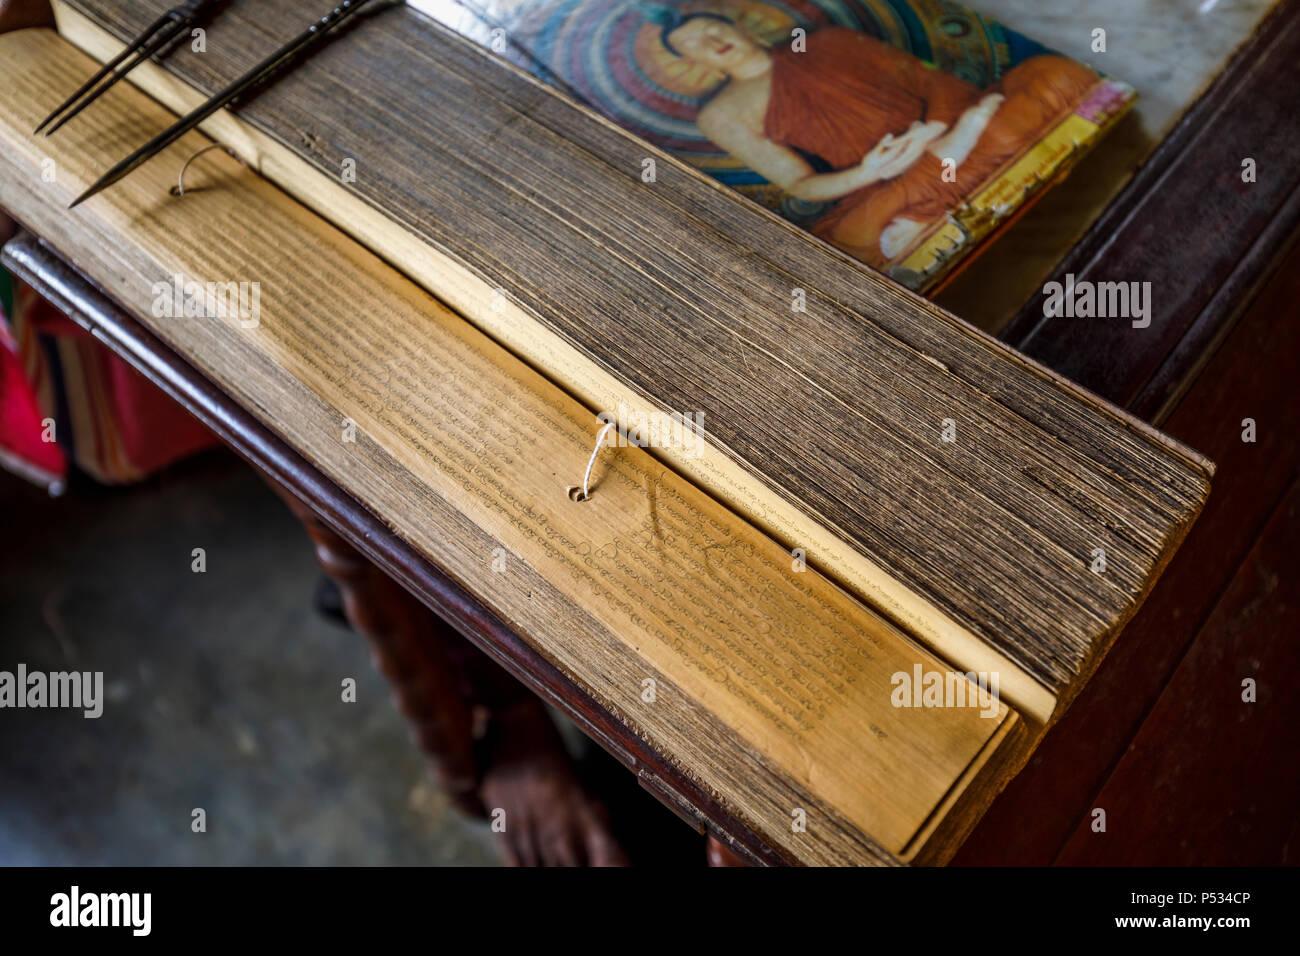 Typical hand-written loose leaf Buddhist book, Sri Wickramasinghe ancient temple, Maduwa Island on the Madu River, Maduganga Lake, southwest Sri Lanka - Stock Image